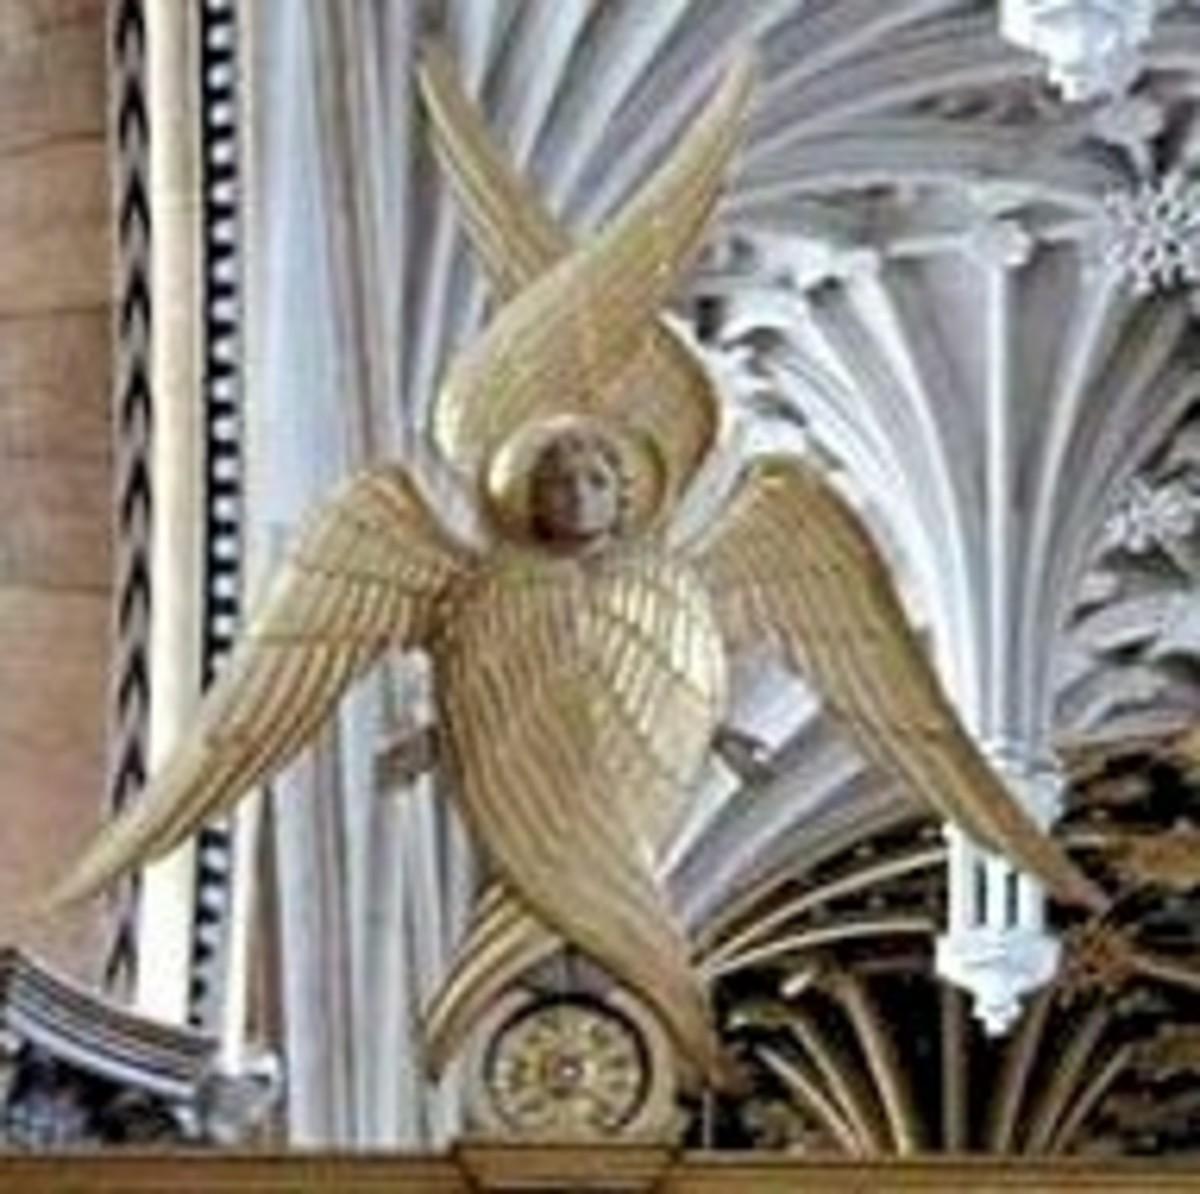 Seraphim (six wings)